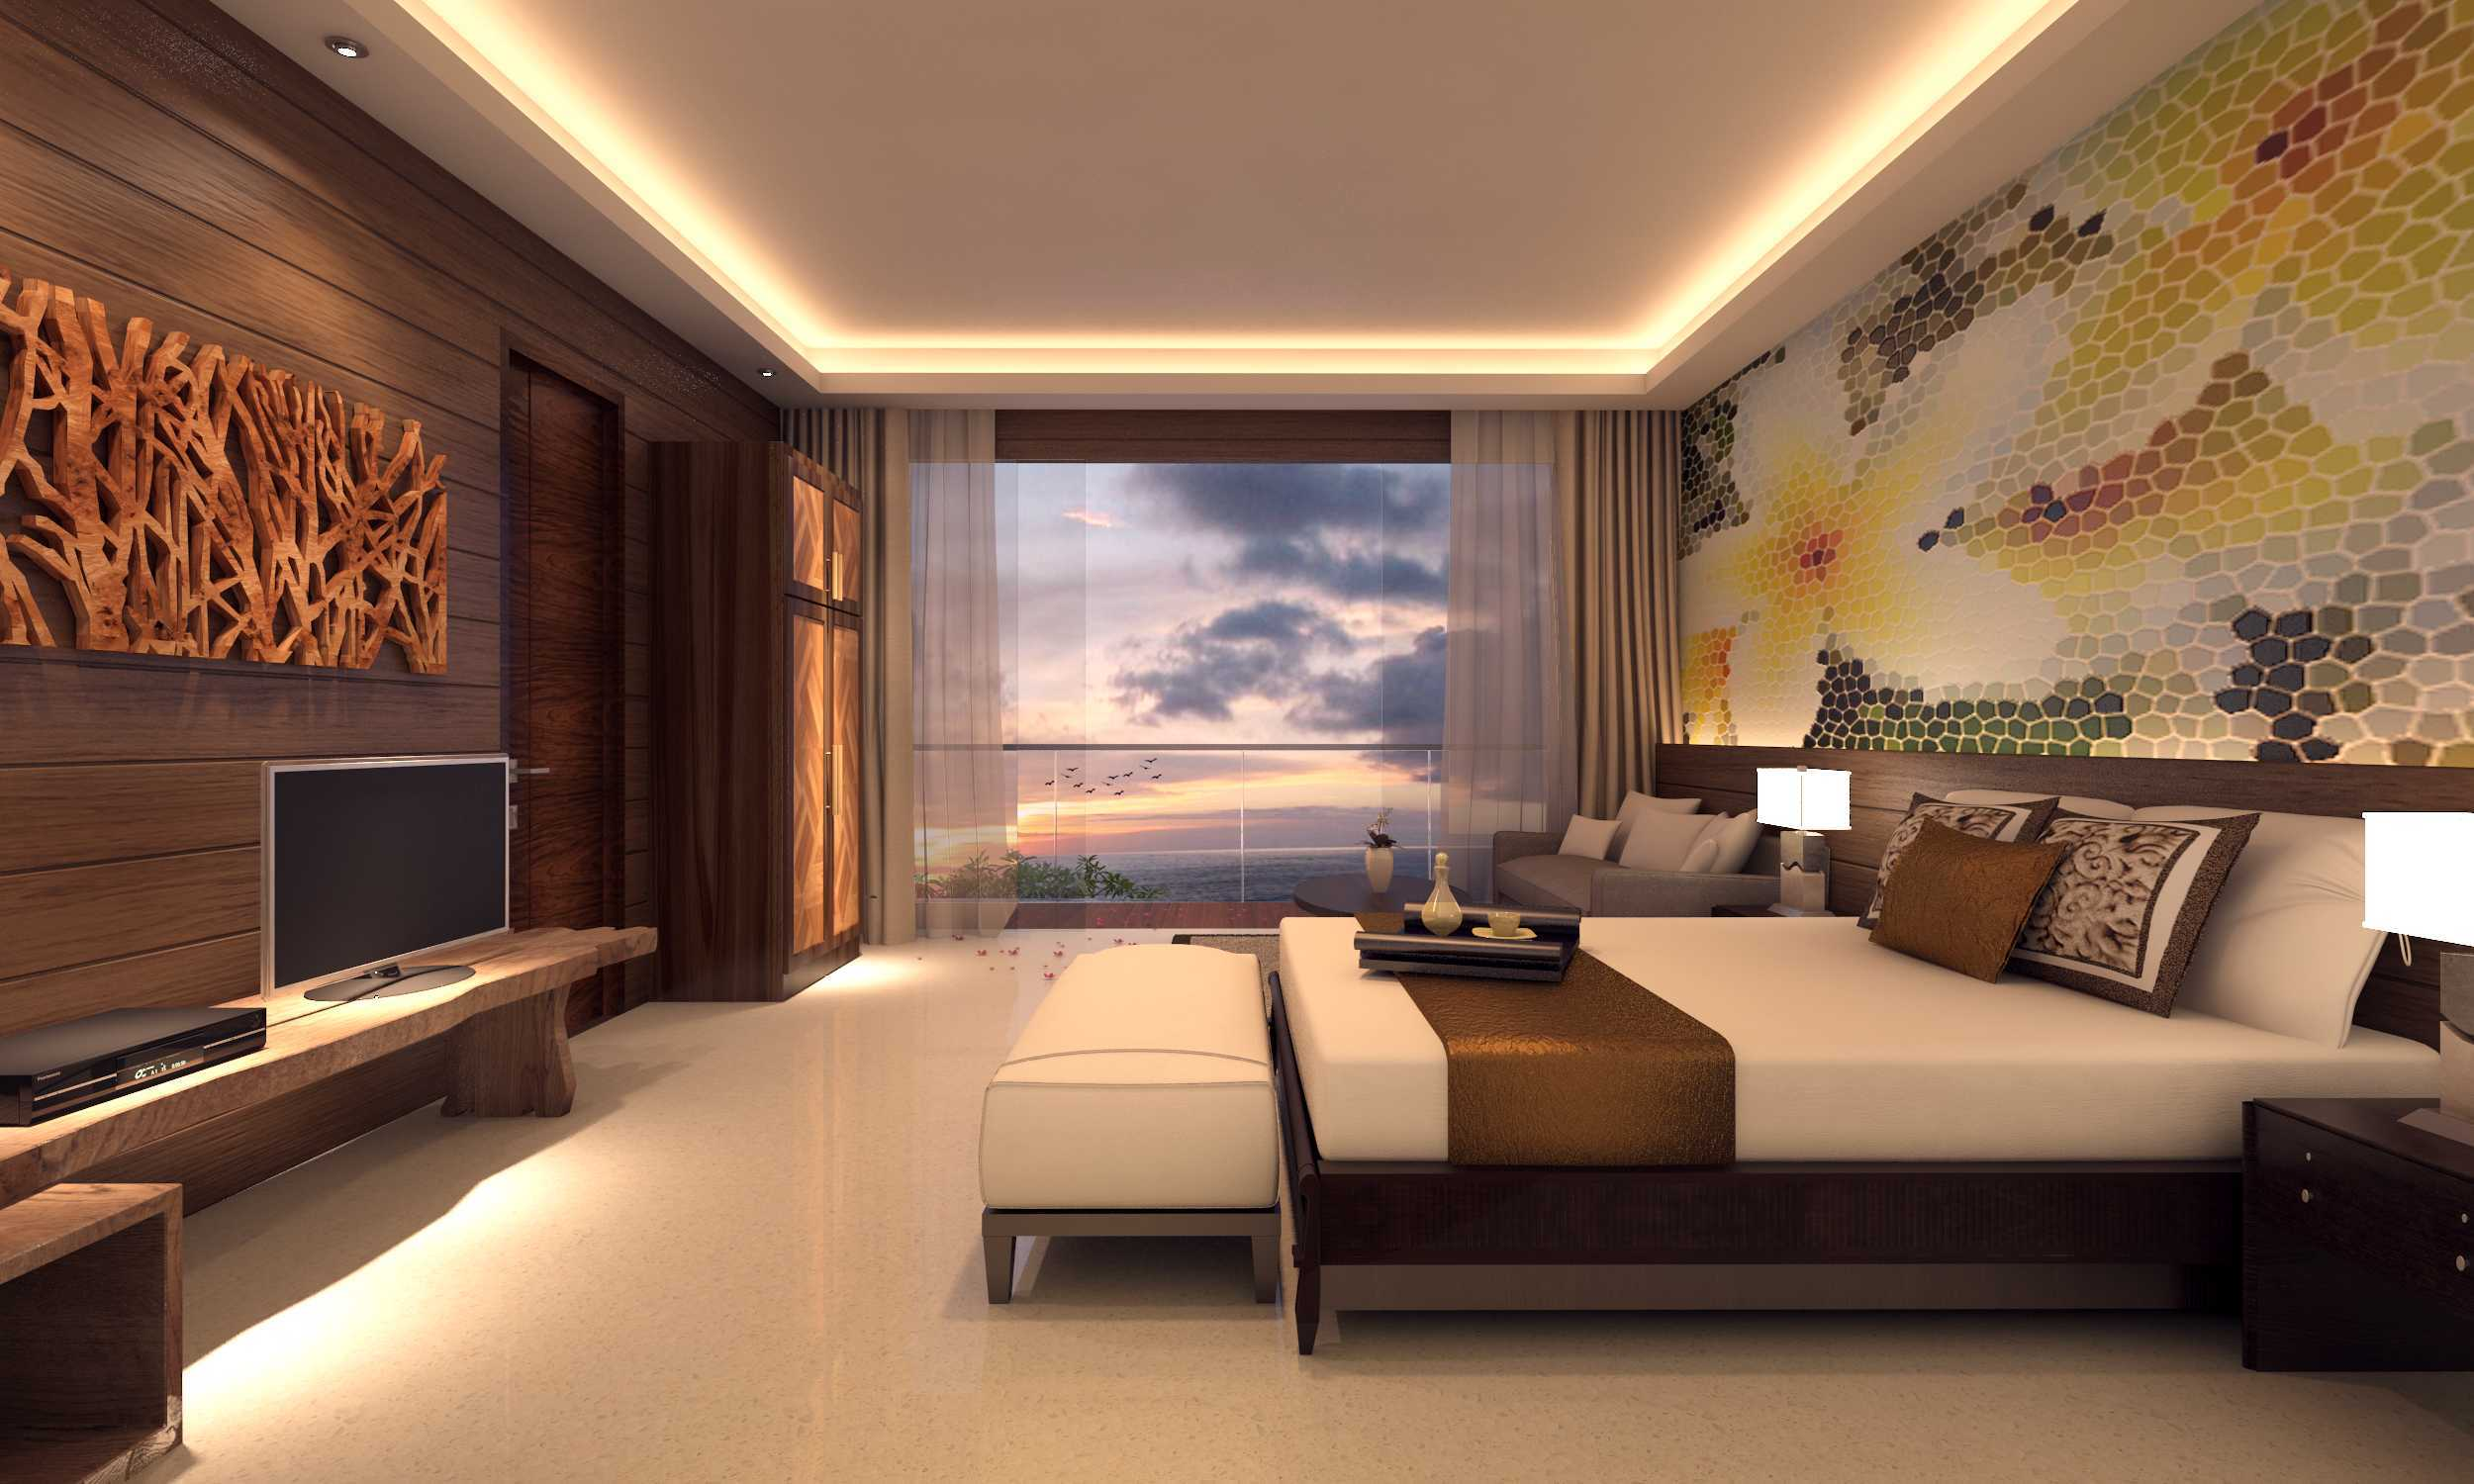 Pt. Grasindo Gemilang Mandiri Villa Ribezzi, Uluwatu - Bali Pecatu, Kuta Sel., Kabupaten Badung, Bali 80361, Indonesia Pecatu, Kuta Sel., Kabupaten Badung, Bali 80361, Indonesia Villa Ribezzi, Uluwatu - Bali  <P>Main Bedroom Design</p> 65261